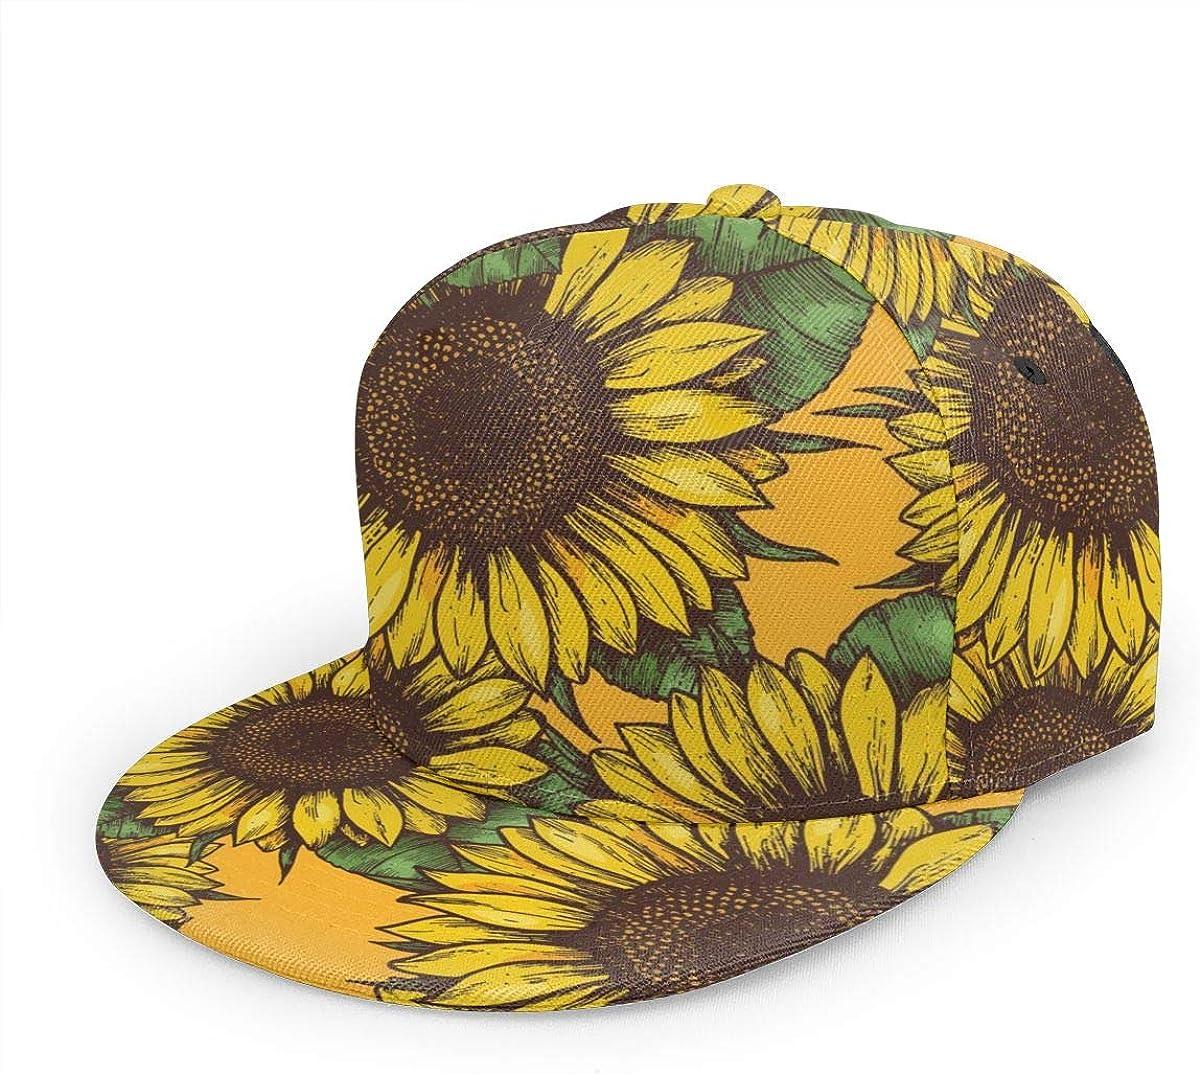 Classic Adjustable Snapback Flat Bill Brim Trucker Hat Sunflower Unisex Baseball Cap Sports Visor Hats